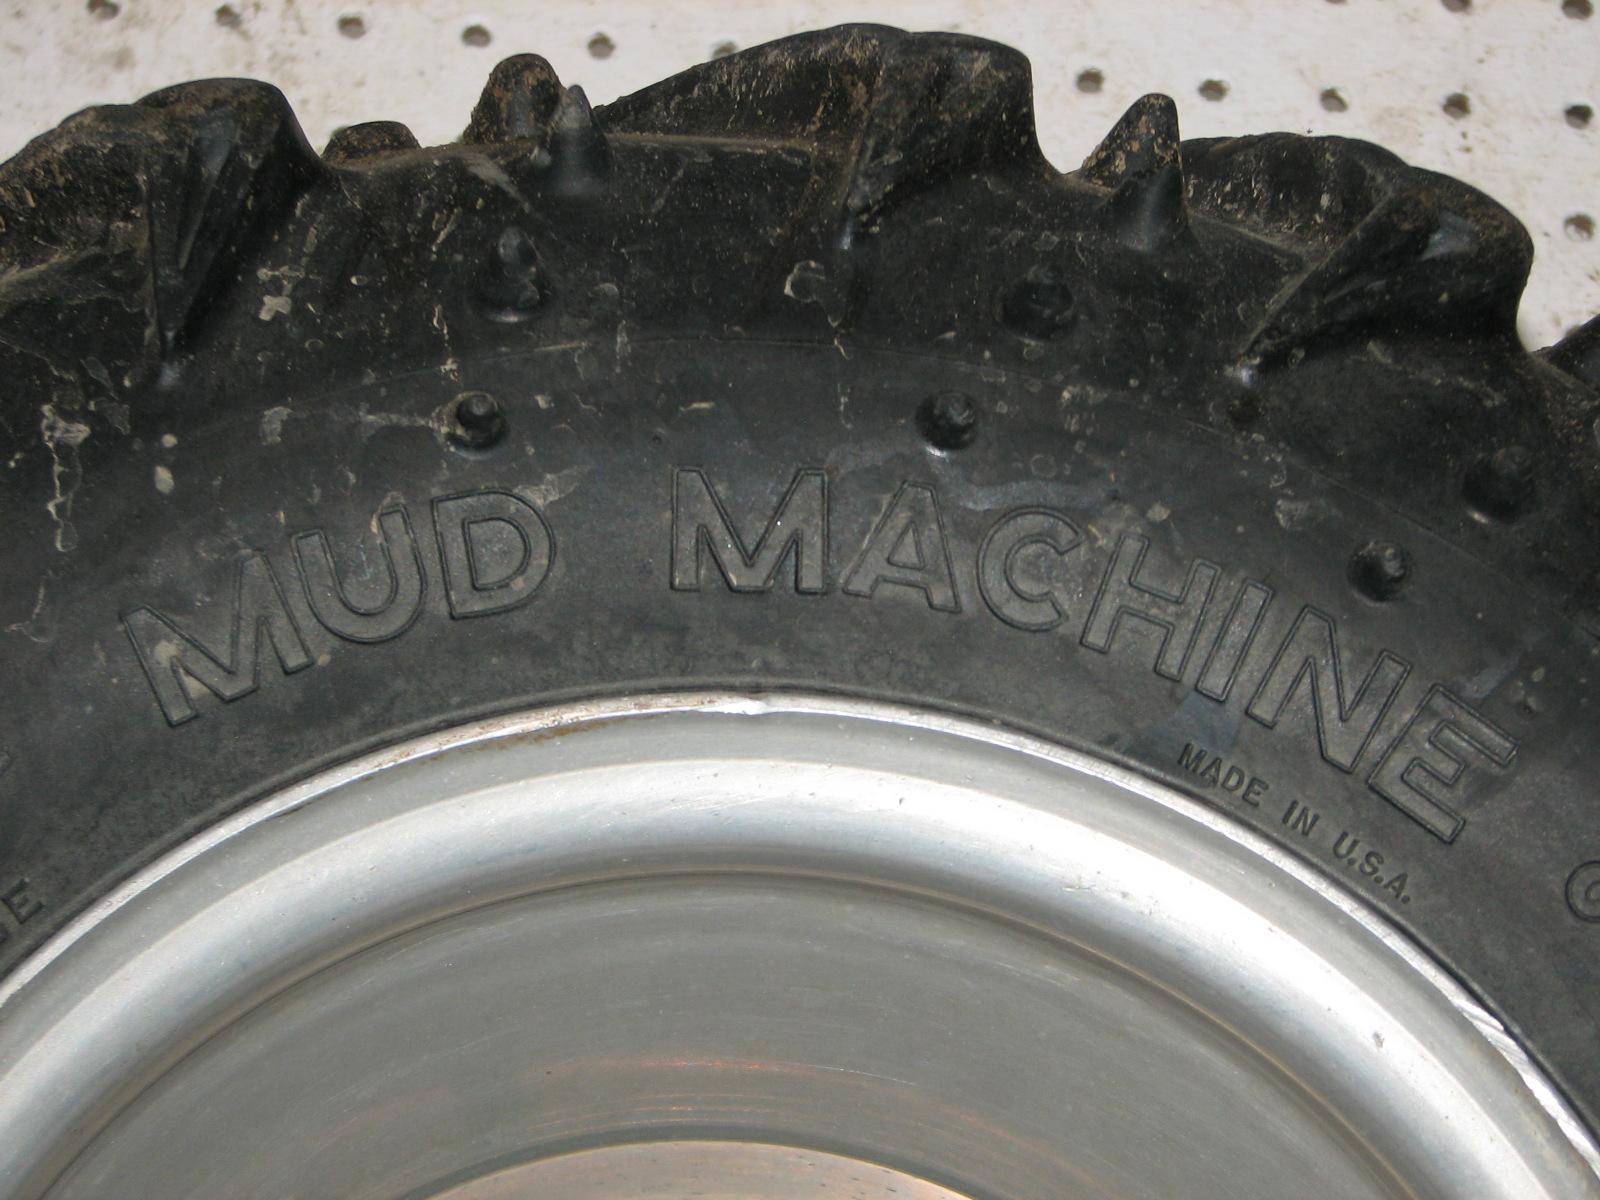 mud machine tires